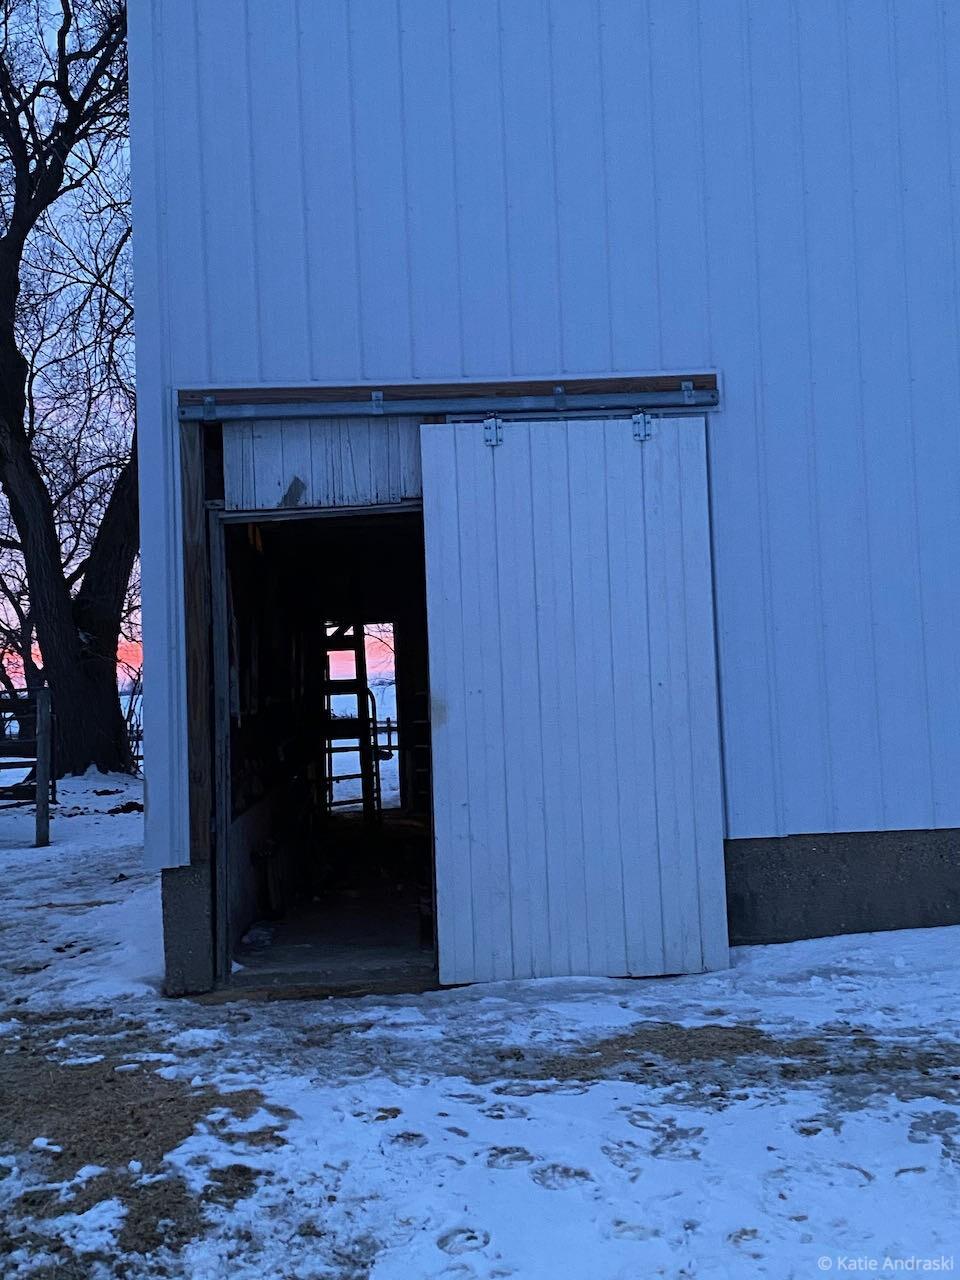 The Barn Doors Stick in Winter: WNIJ Perspective